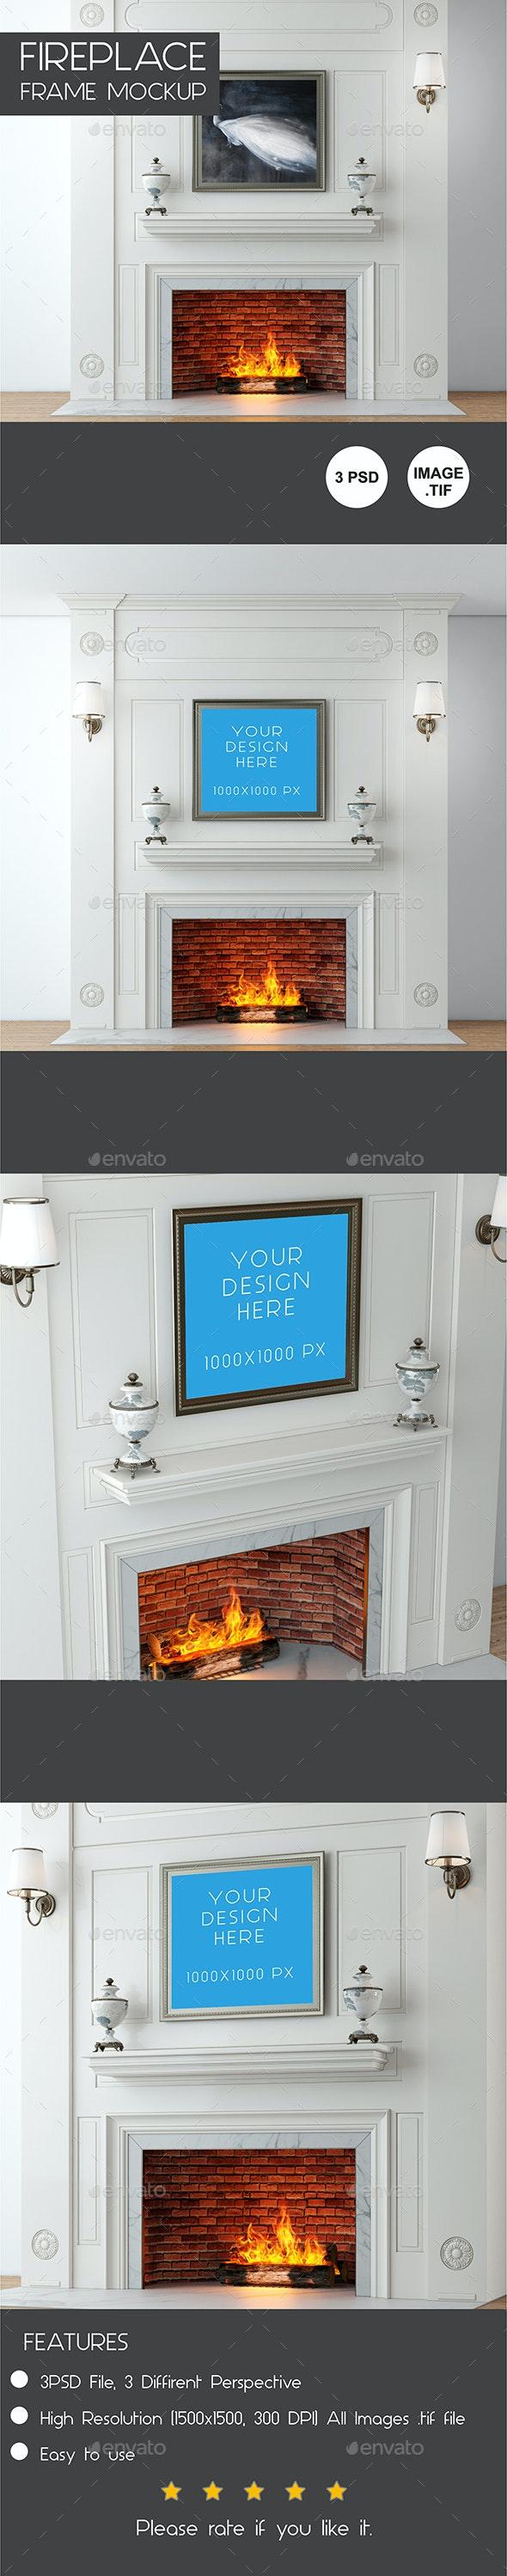 Fireplace Frame Mockup - Posters Print